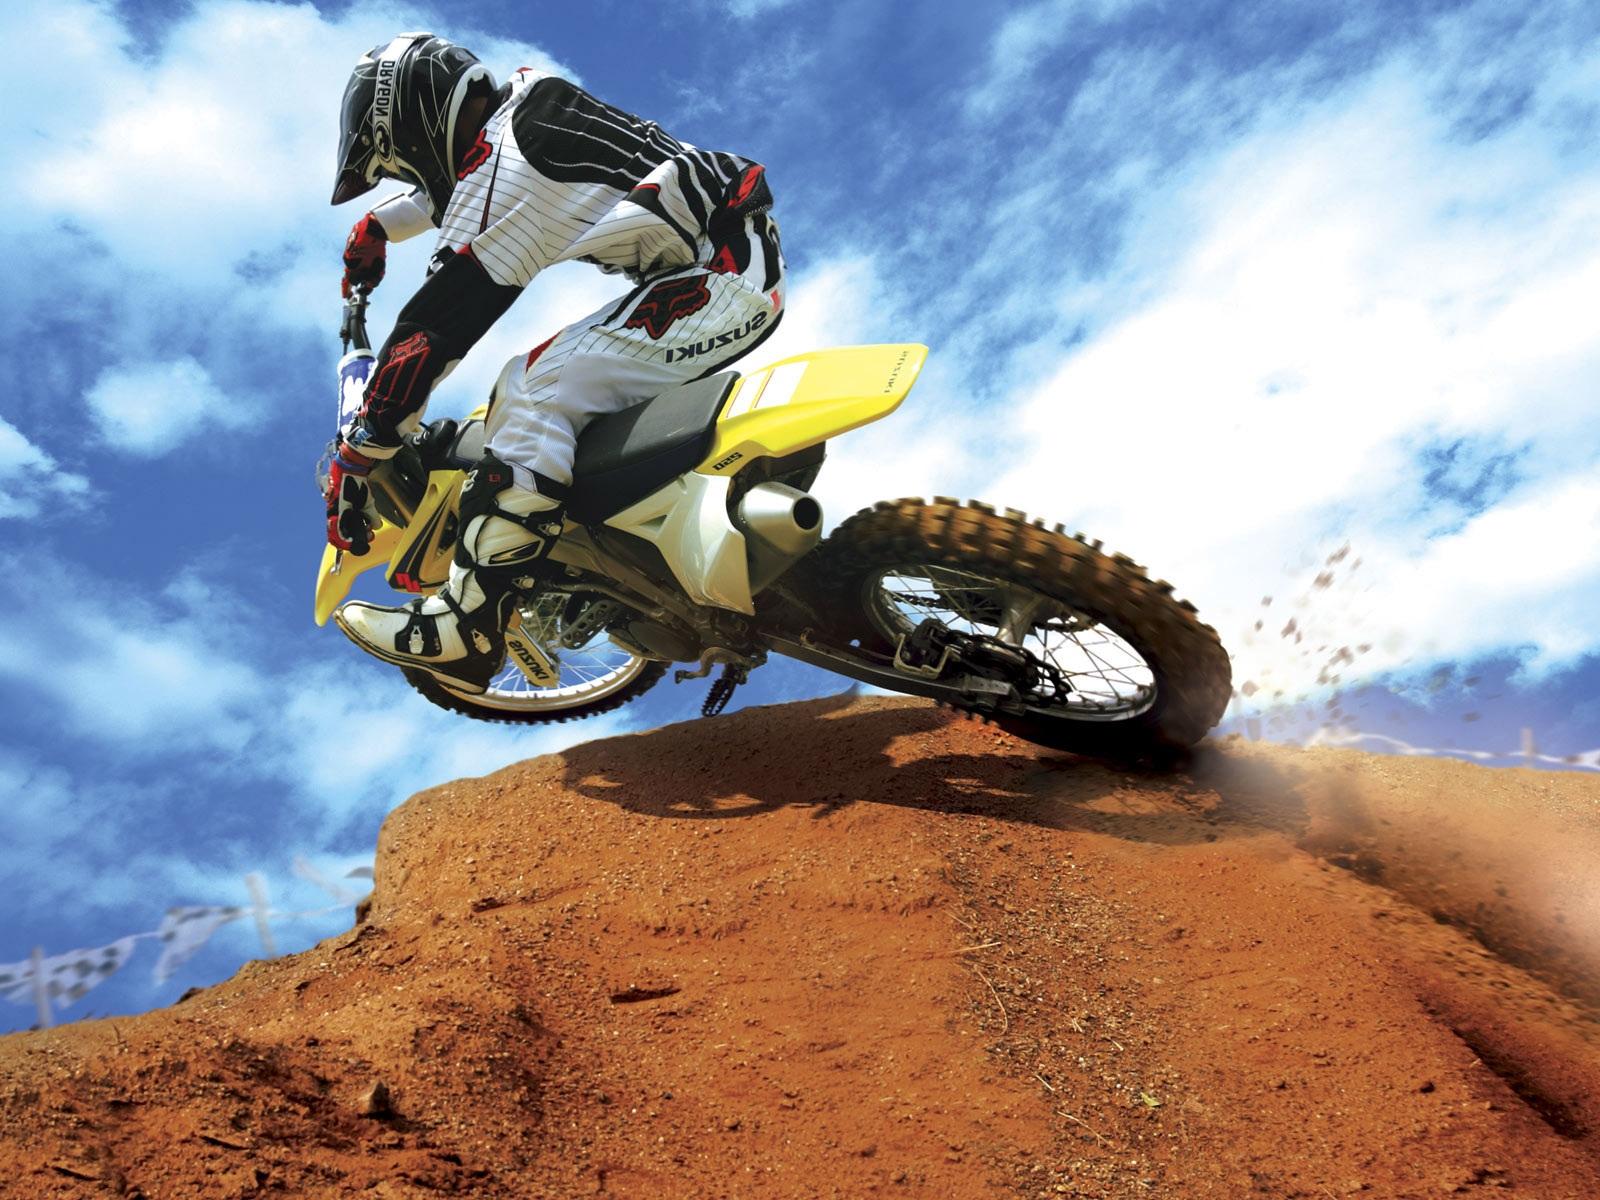 motocross wallpaper 3 motocross wallpaper 4 motocross wallpaper 5 1600x1200